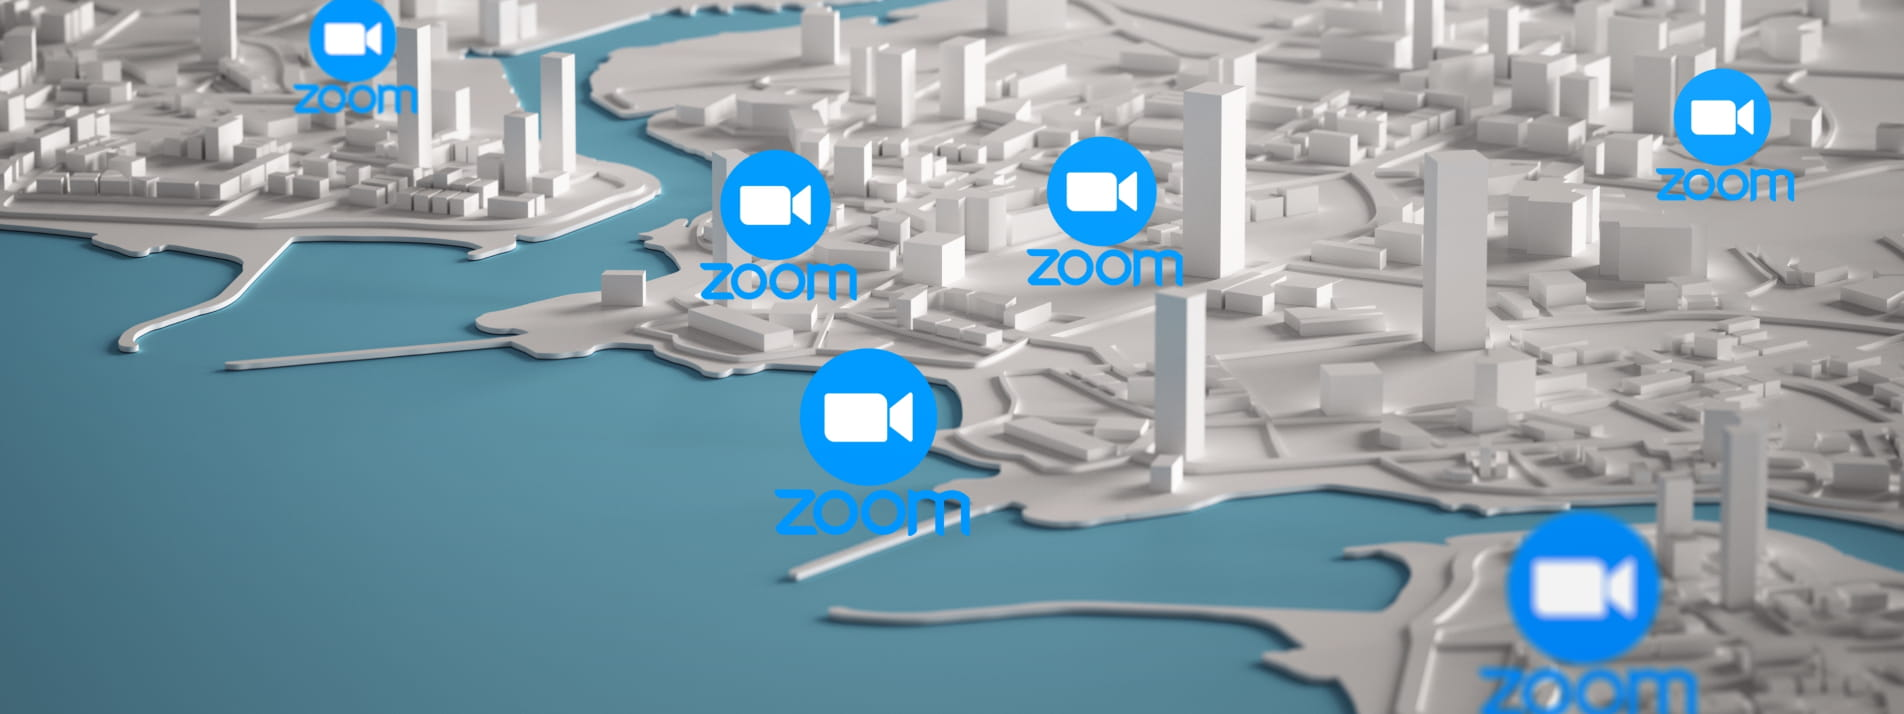 Zoom, la alternativa a Skype para tus videollamadas